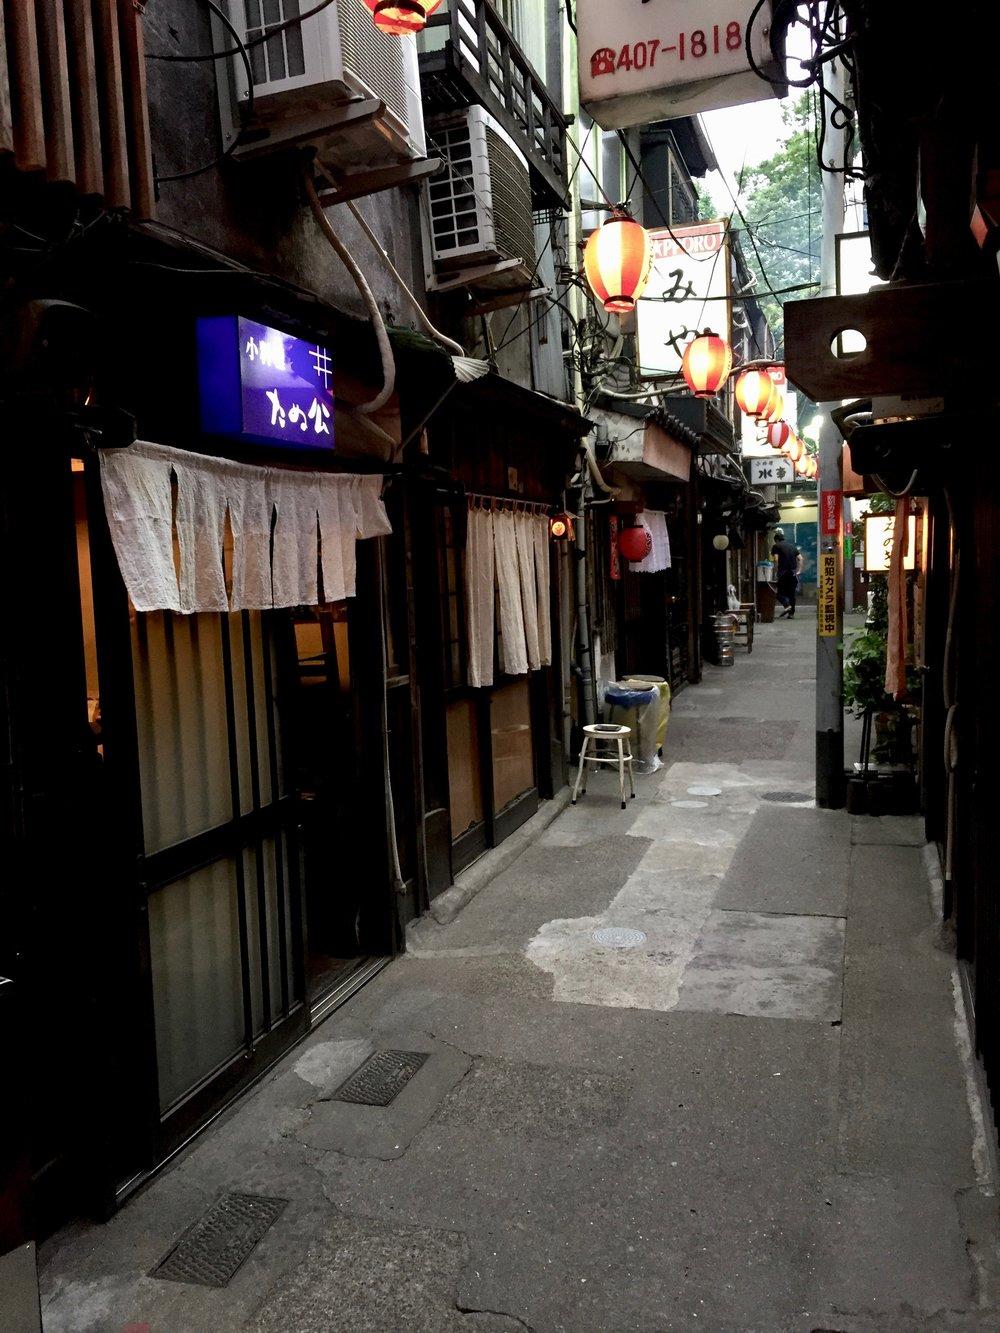 drinking alley nonbei yokocho in shibuya tokyo japan